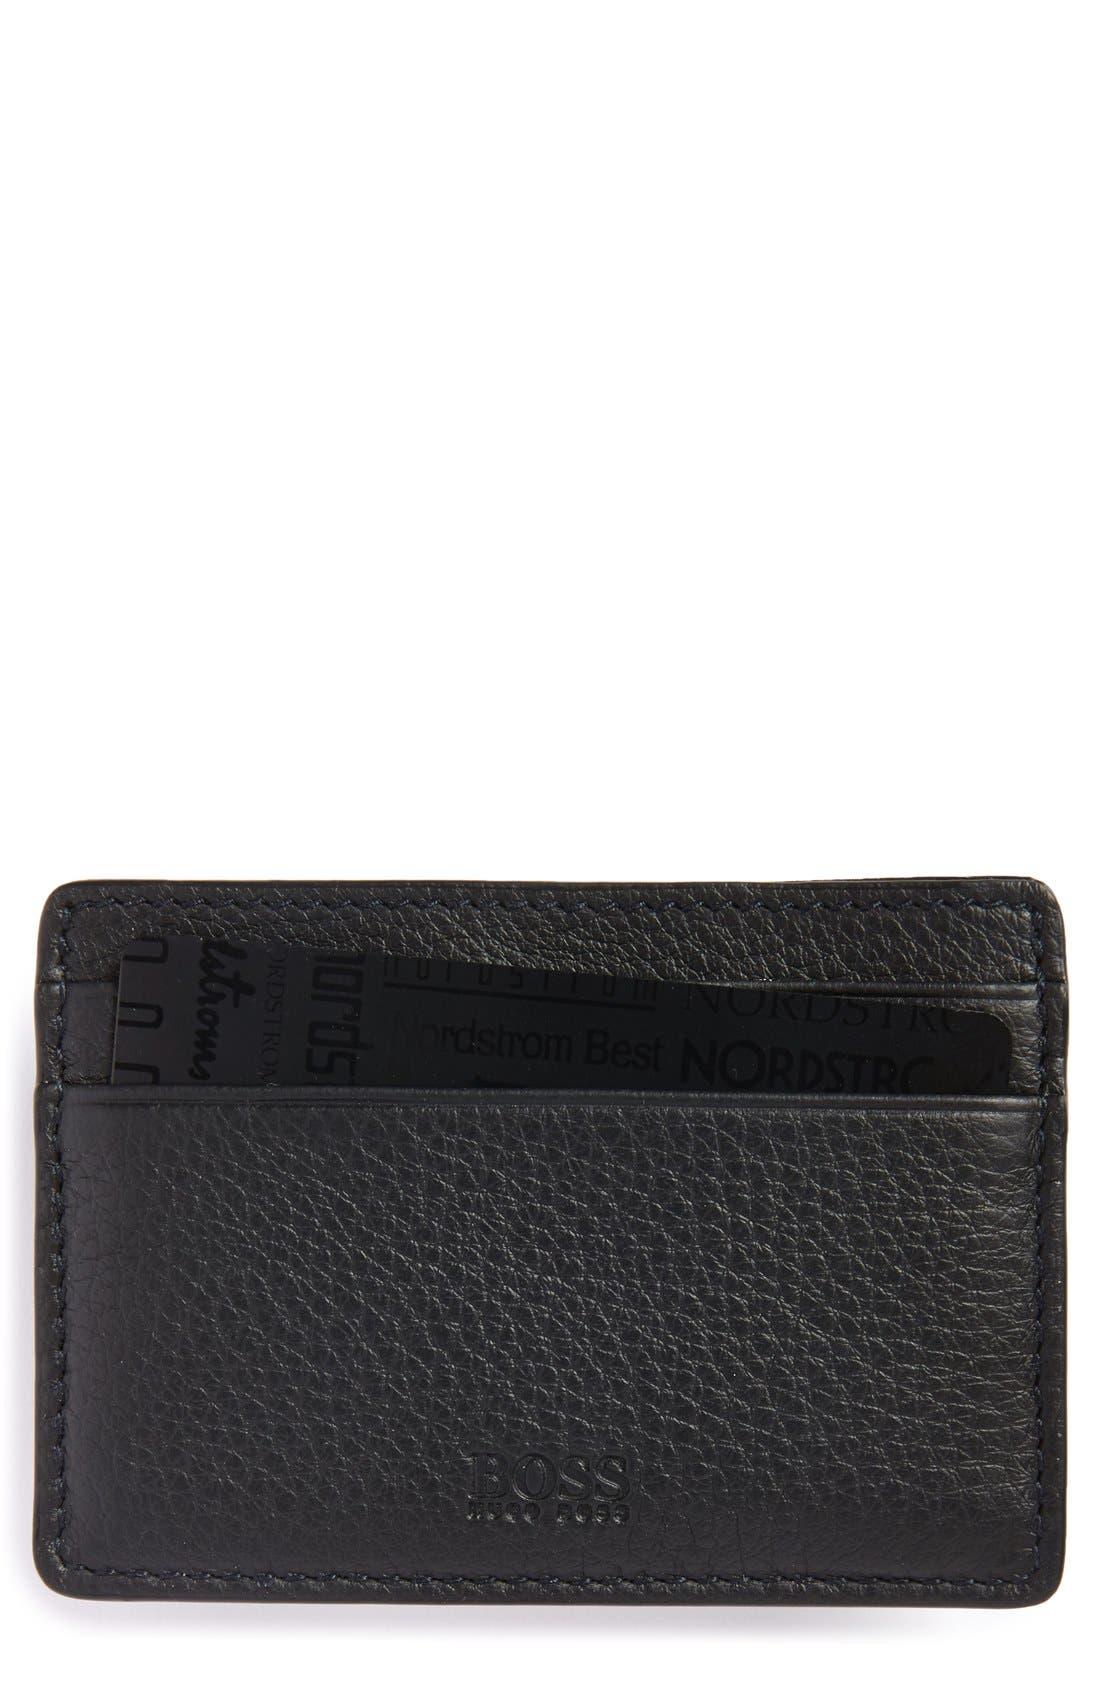 Traveler Card Case,                             Main thumbnail 1, color,                             Black